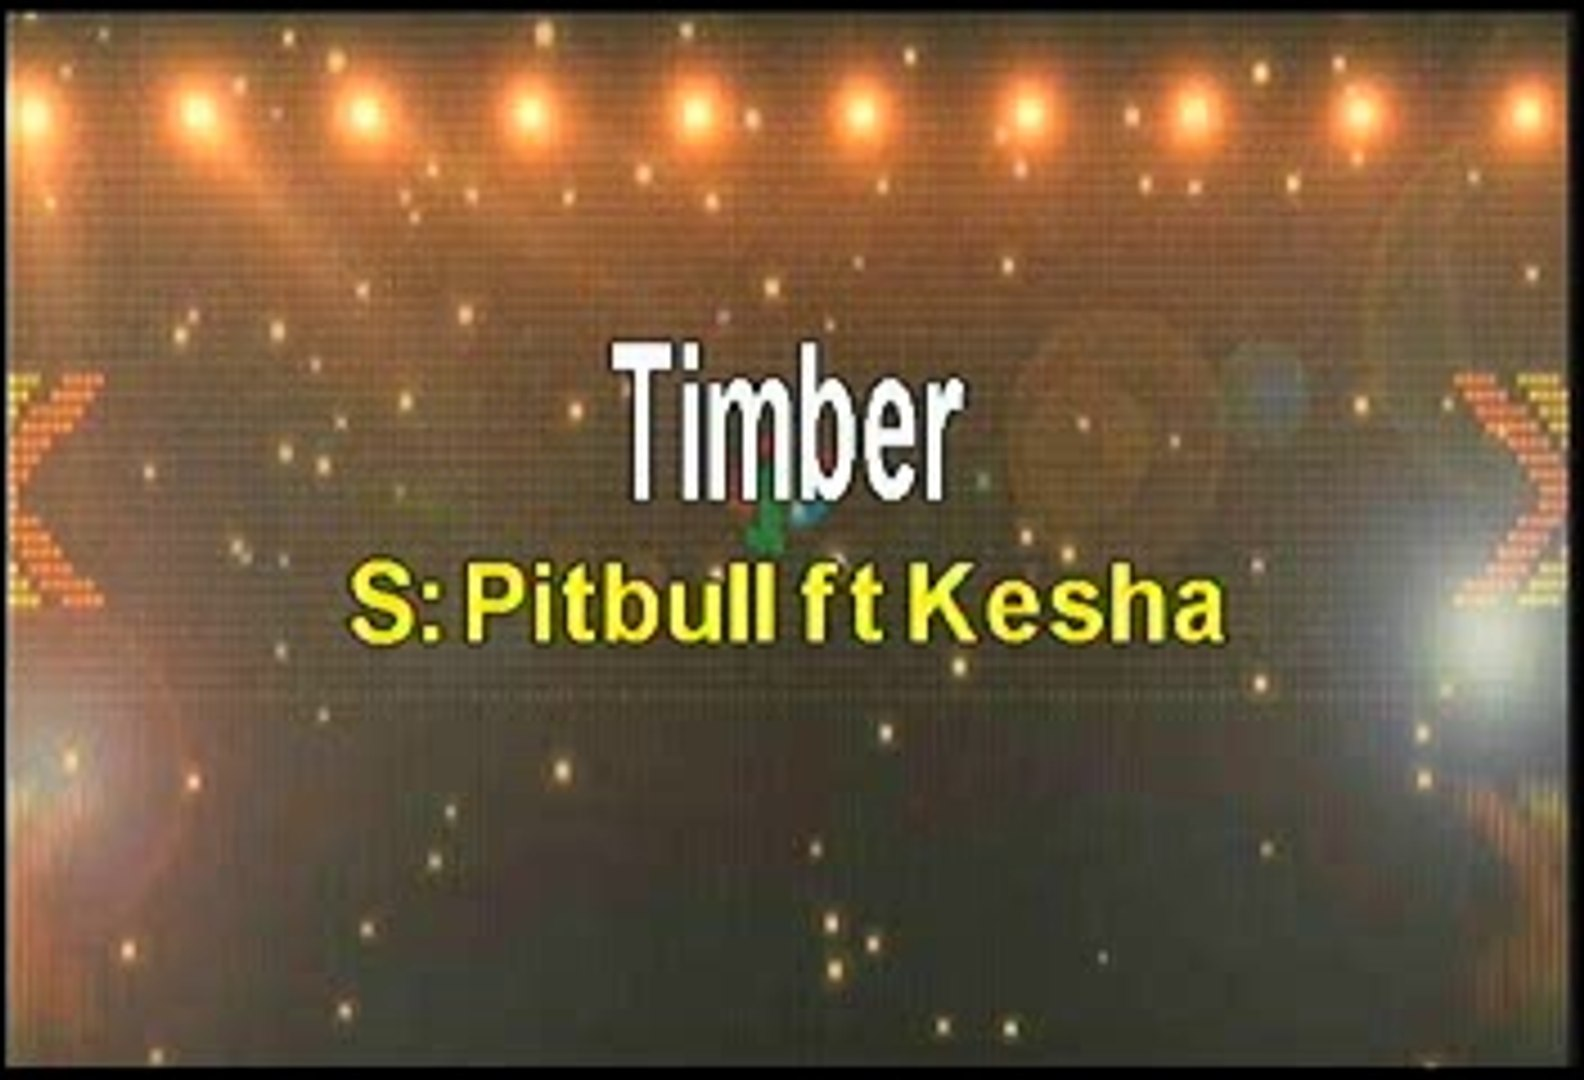 kesha ft pitbull timber mp3 download